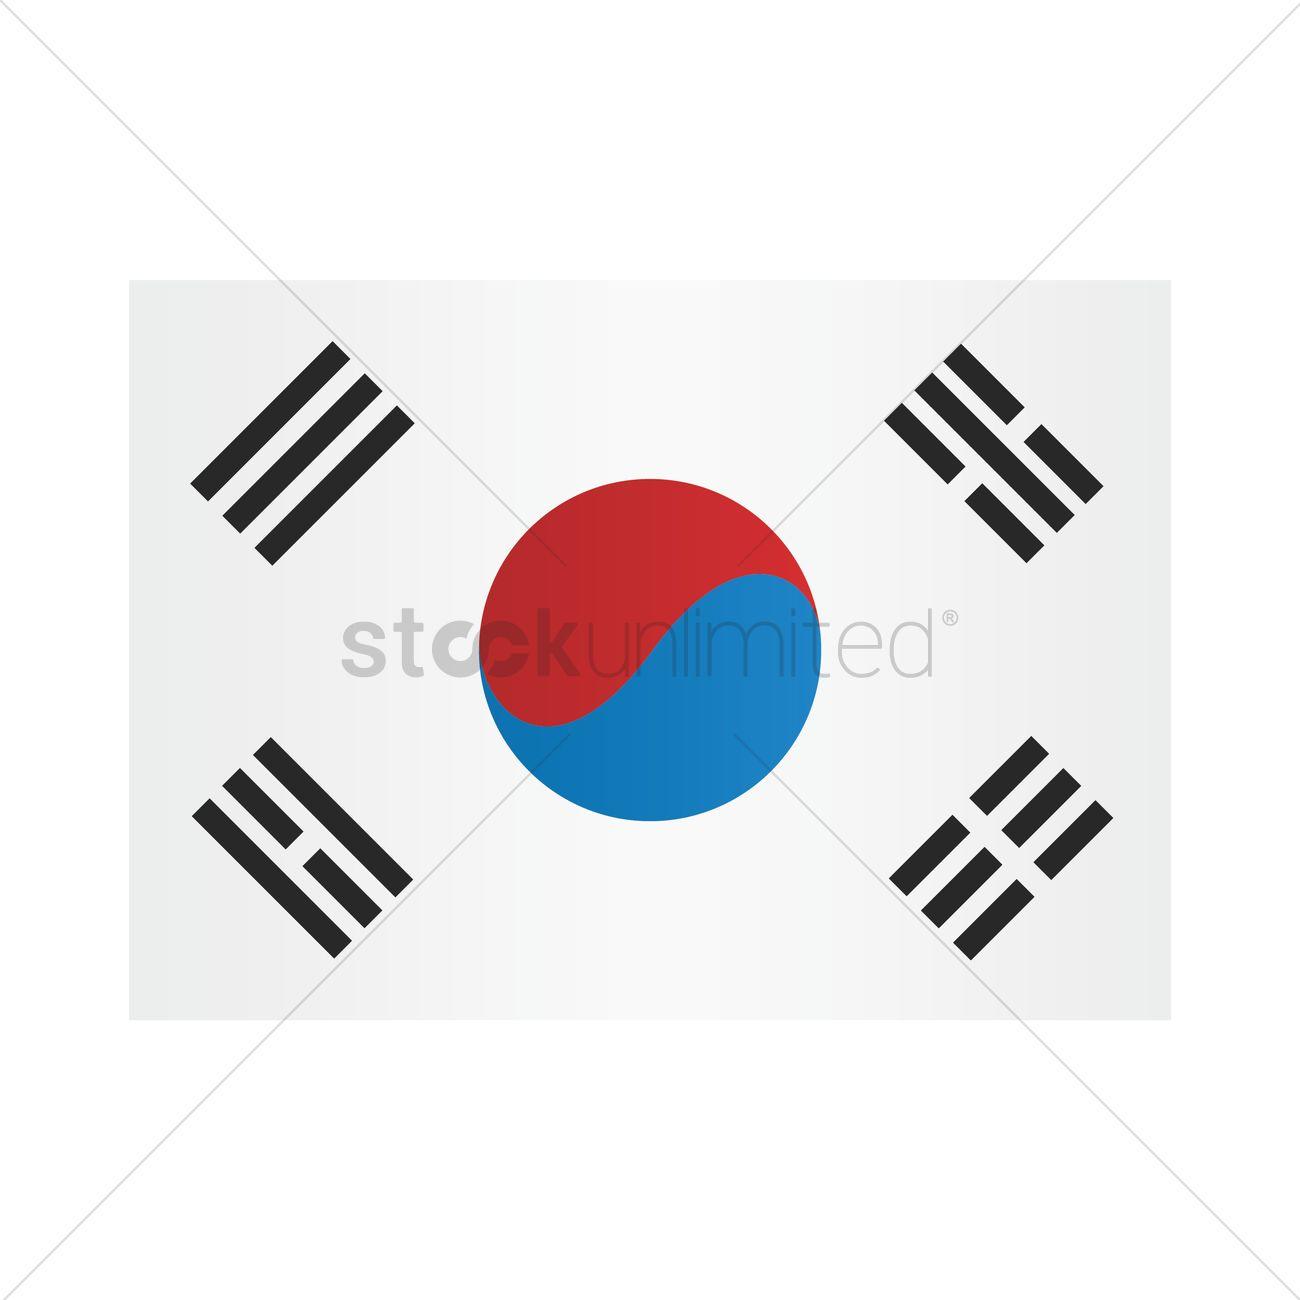 south korean flag vector image 2016306 stockunlimited rh stockunlimited com south korea flag vector download